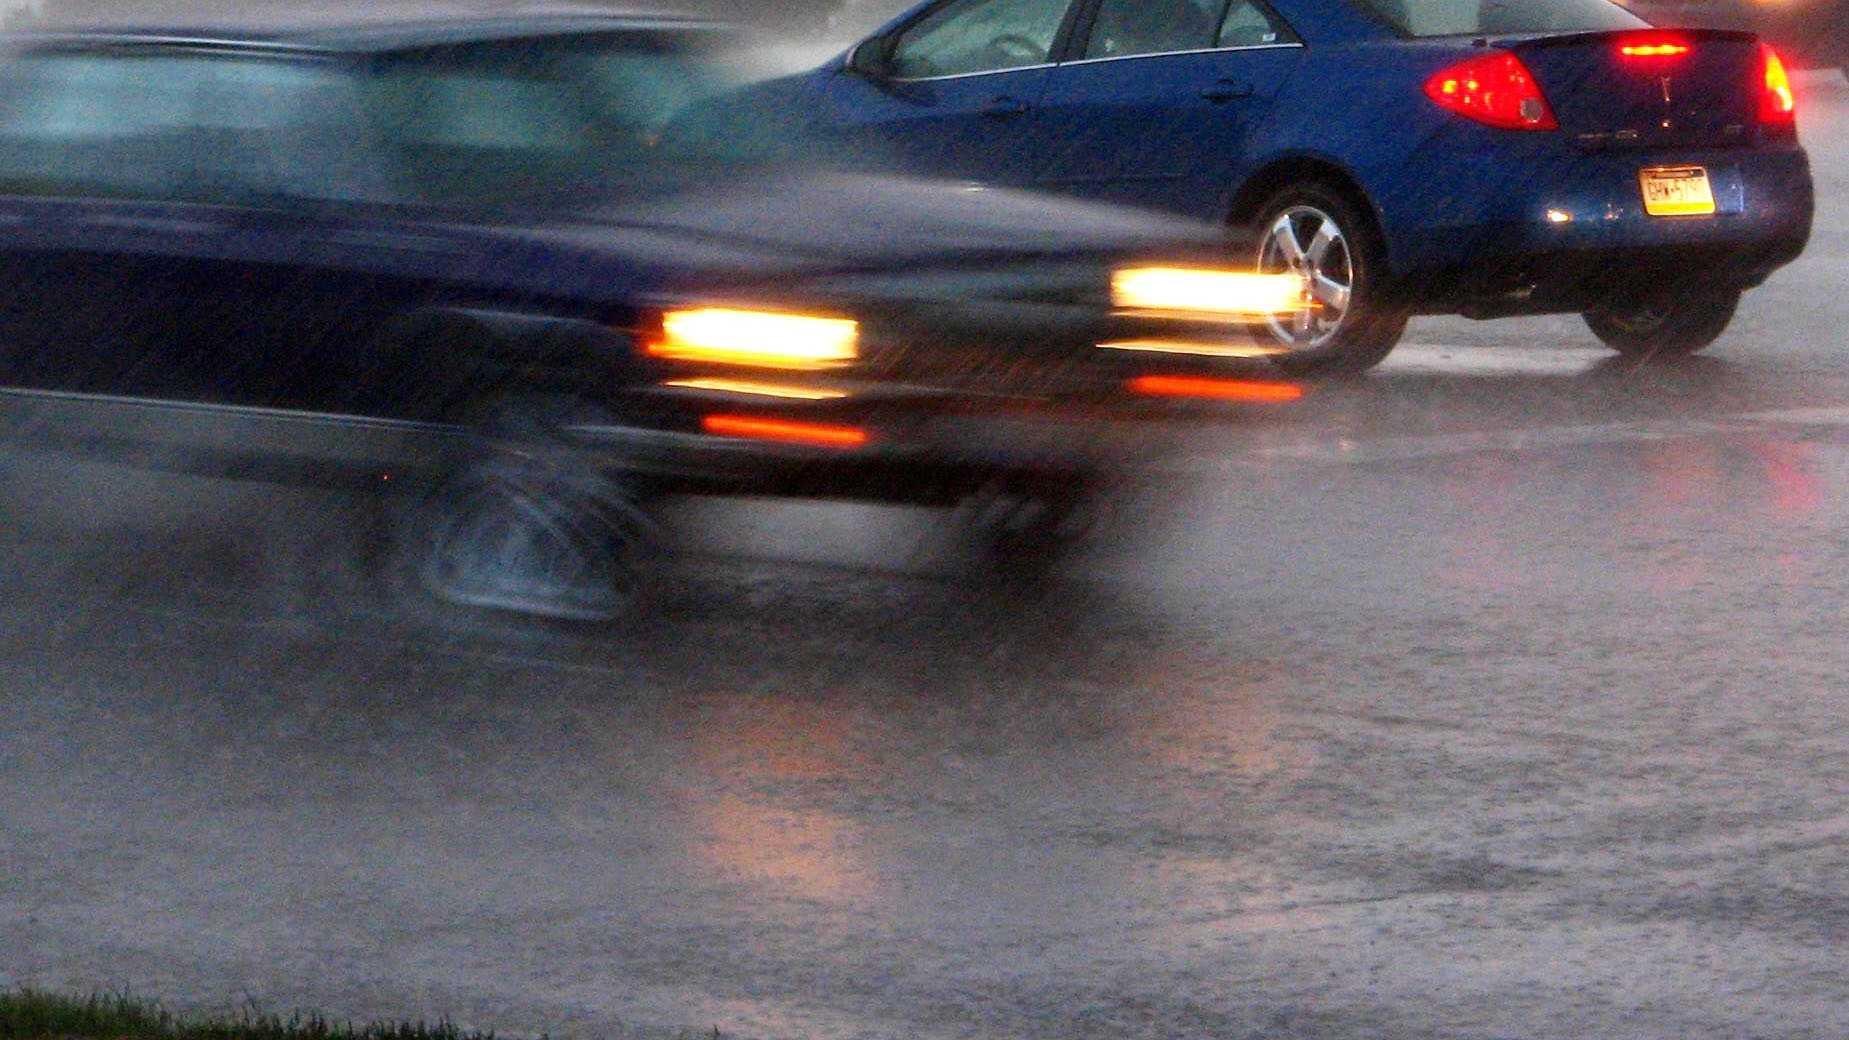 Rain Generic Traffic Day Evening Storm - 13610833